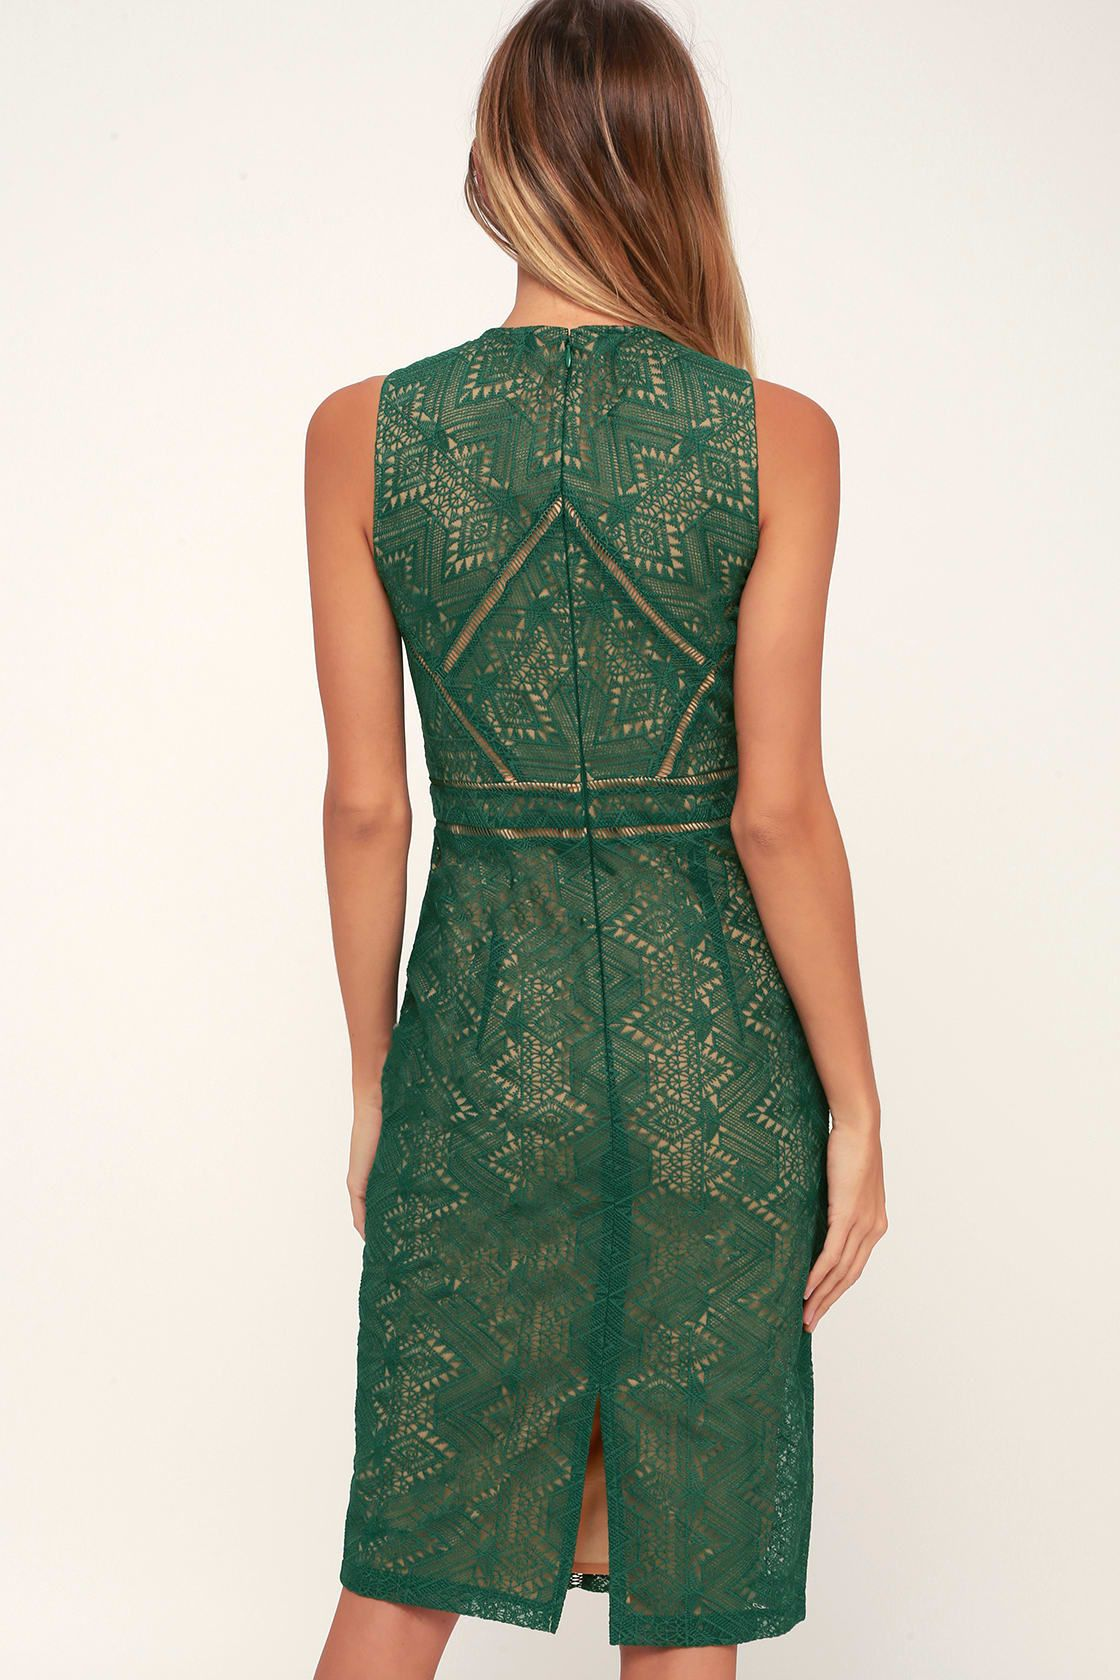 Lulus Eve Dark Green Lace Sheath Midi Dress Size Medium